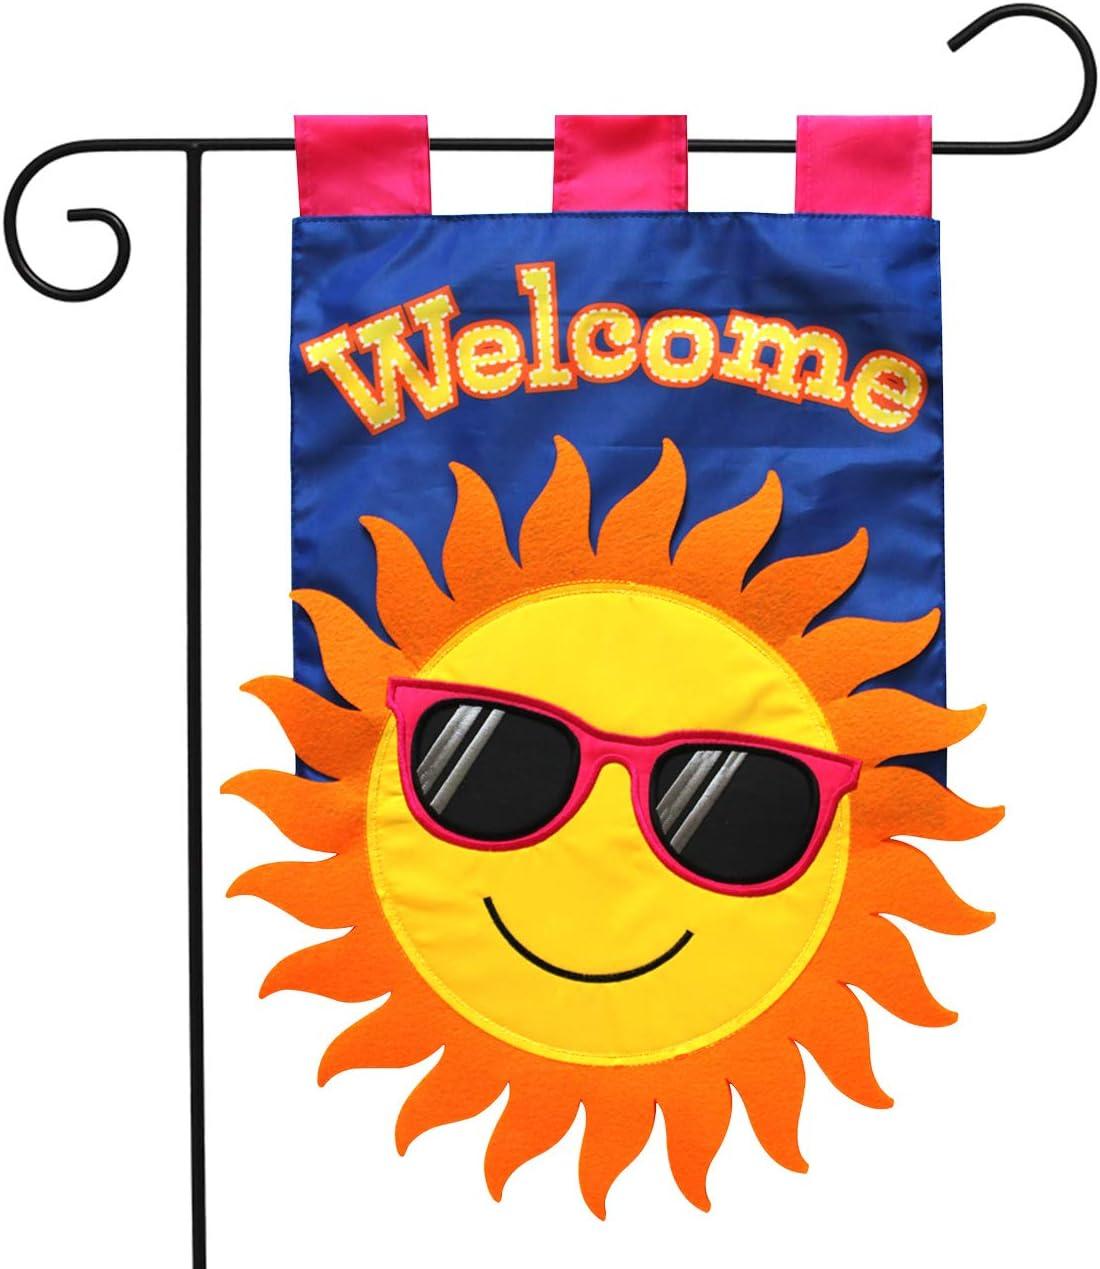 "Briarwood Lane Summer Sun Applique Garden Flag Welcome Sunshine 12.5"" x 18"""